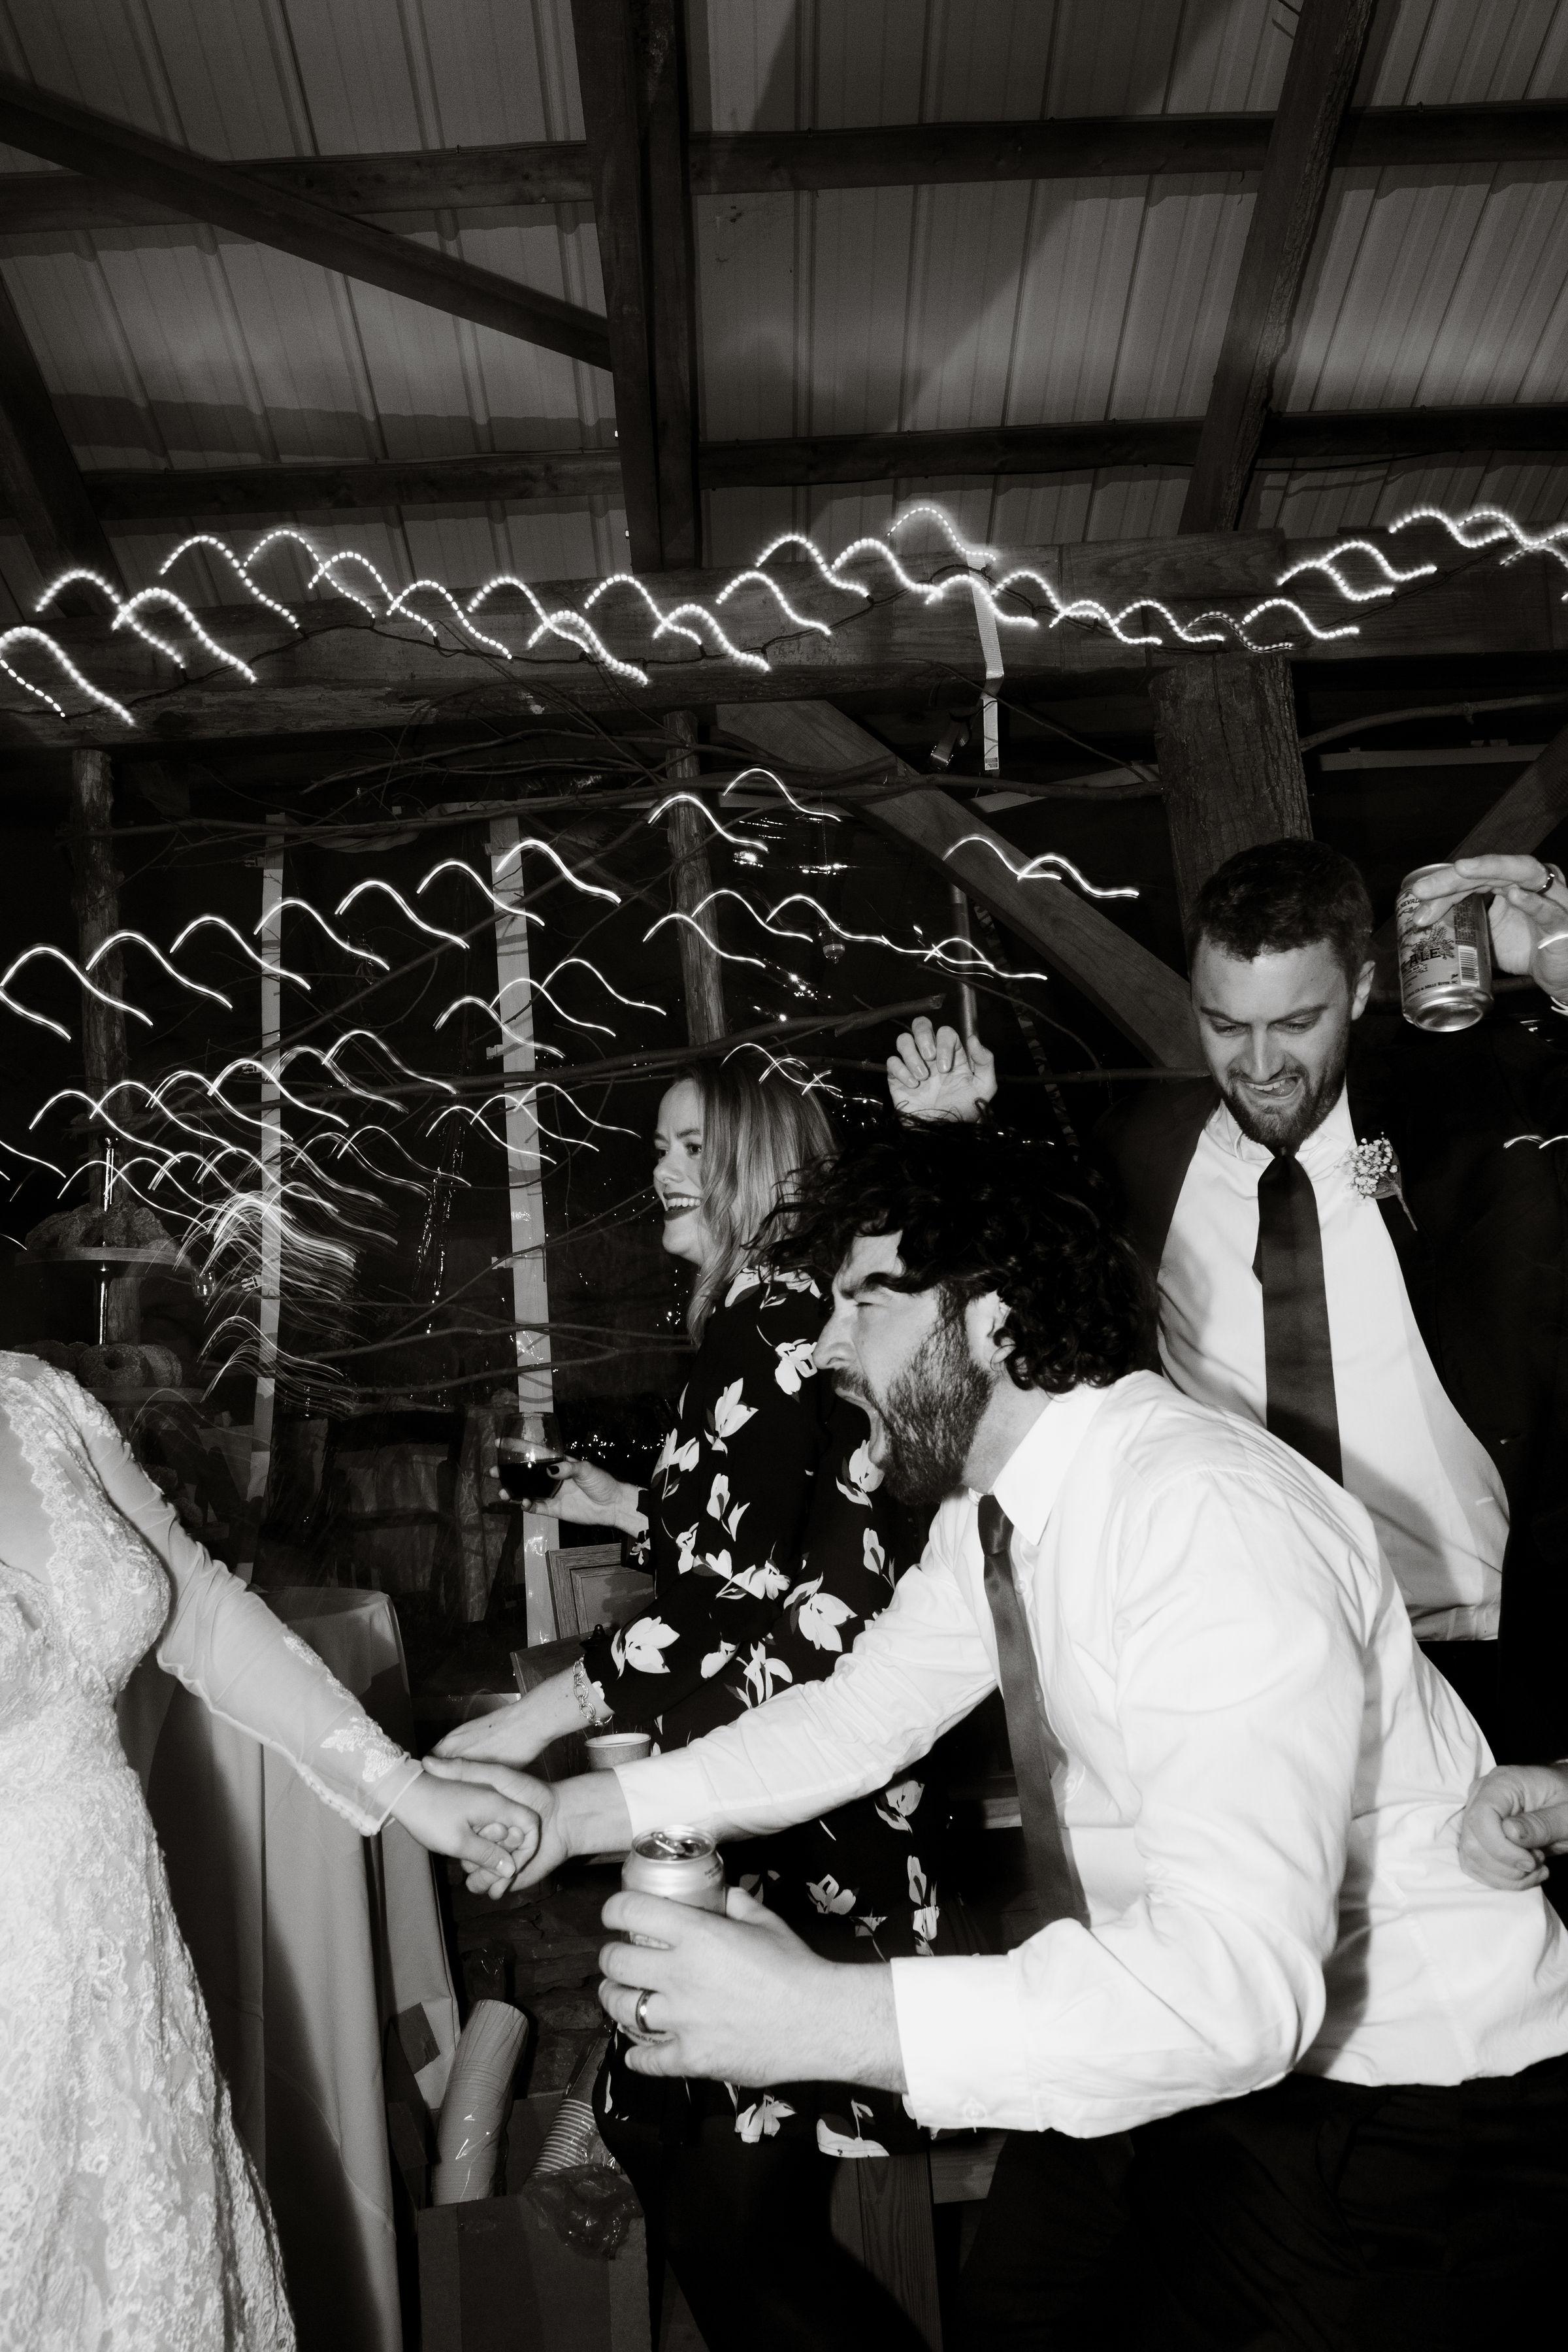 young-love-media-rustic-fall-autumn-wedding-emmerich-tree-farm-hudson-valley-warwick-new-york-reception-363.jpg